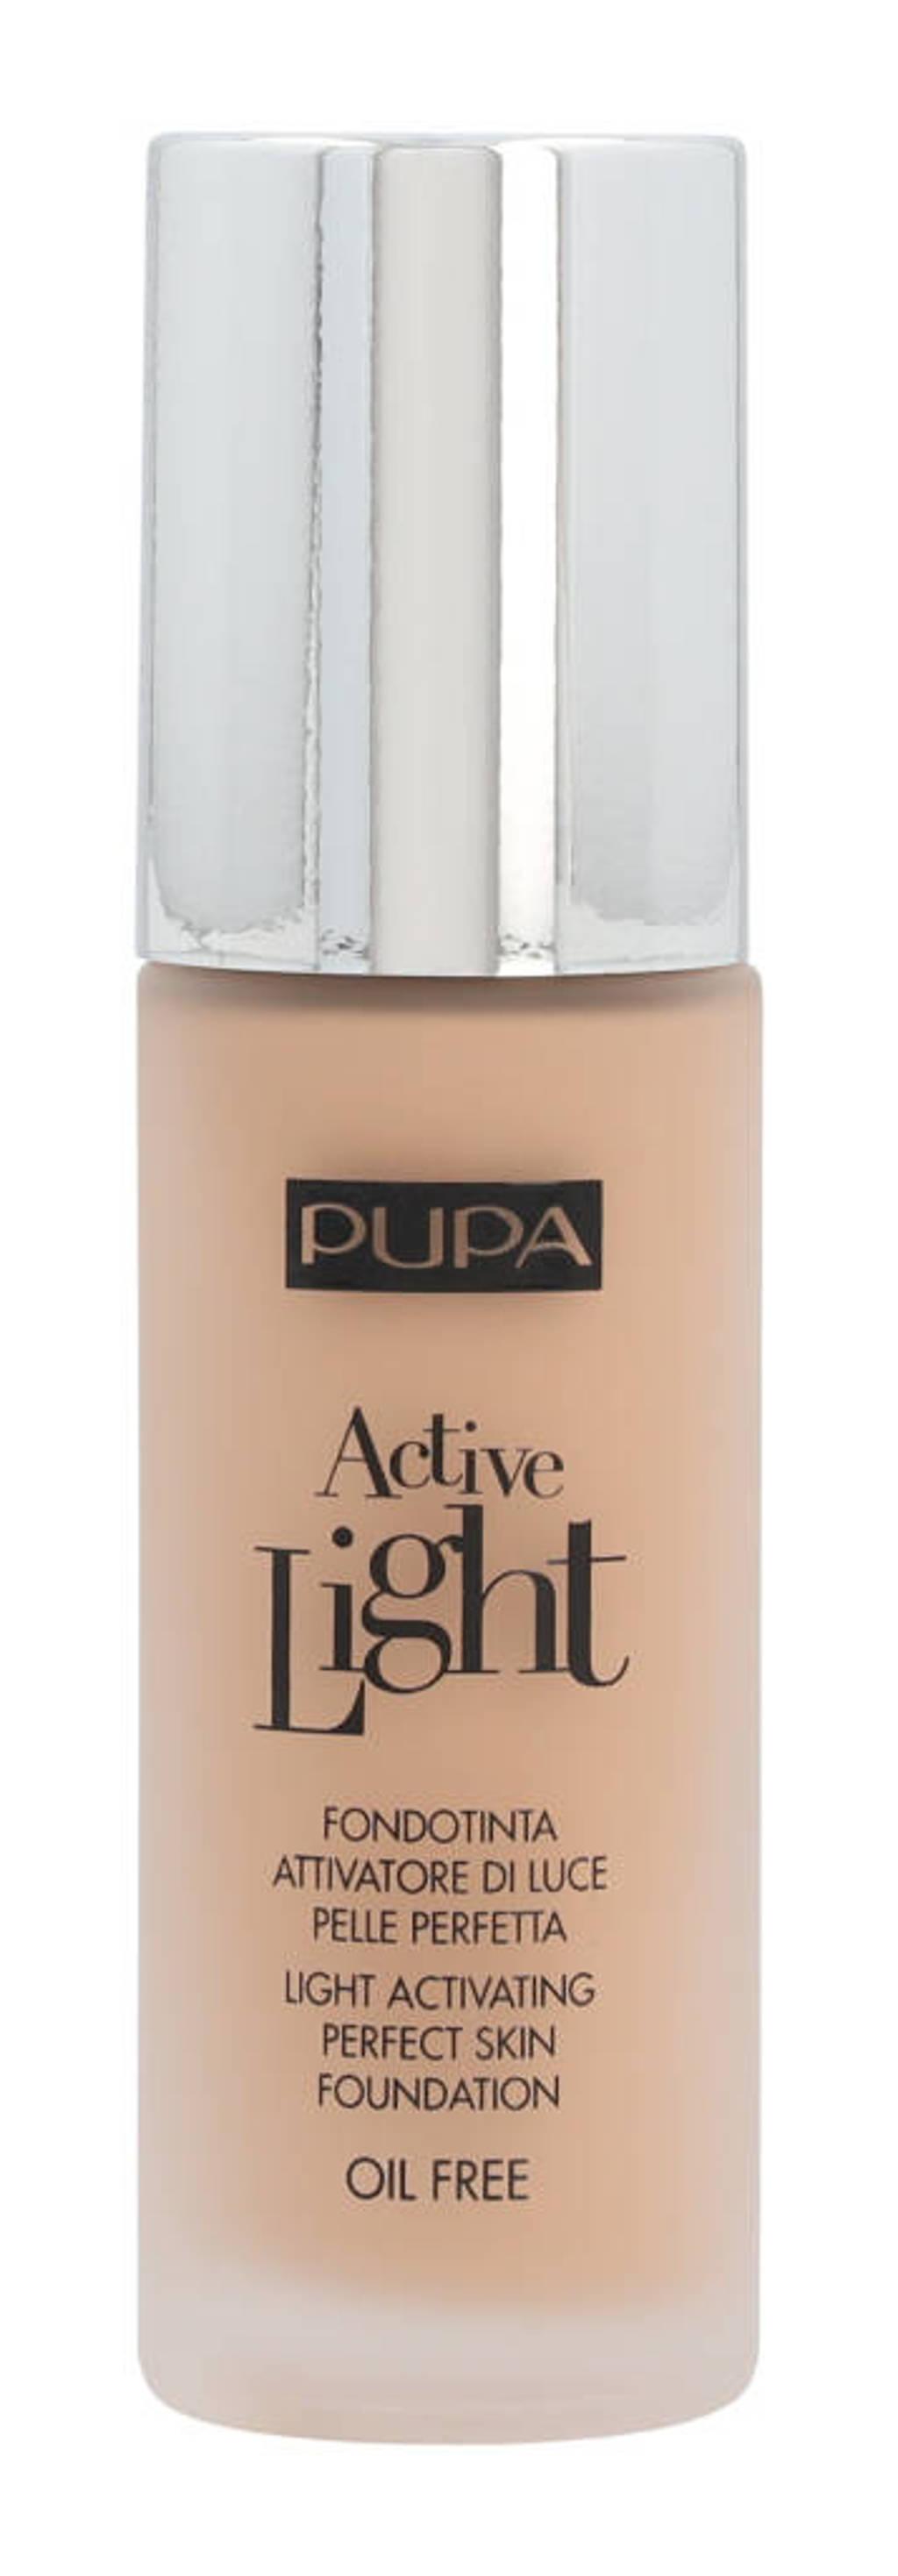 Pupa Milano Active Light foundation - 010 Porcelain